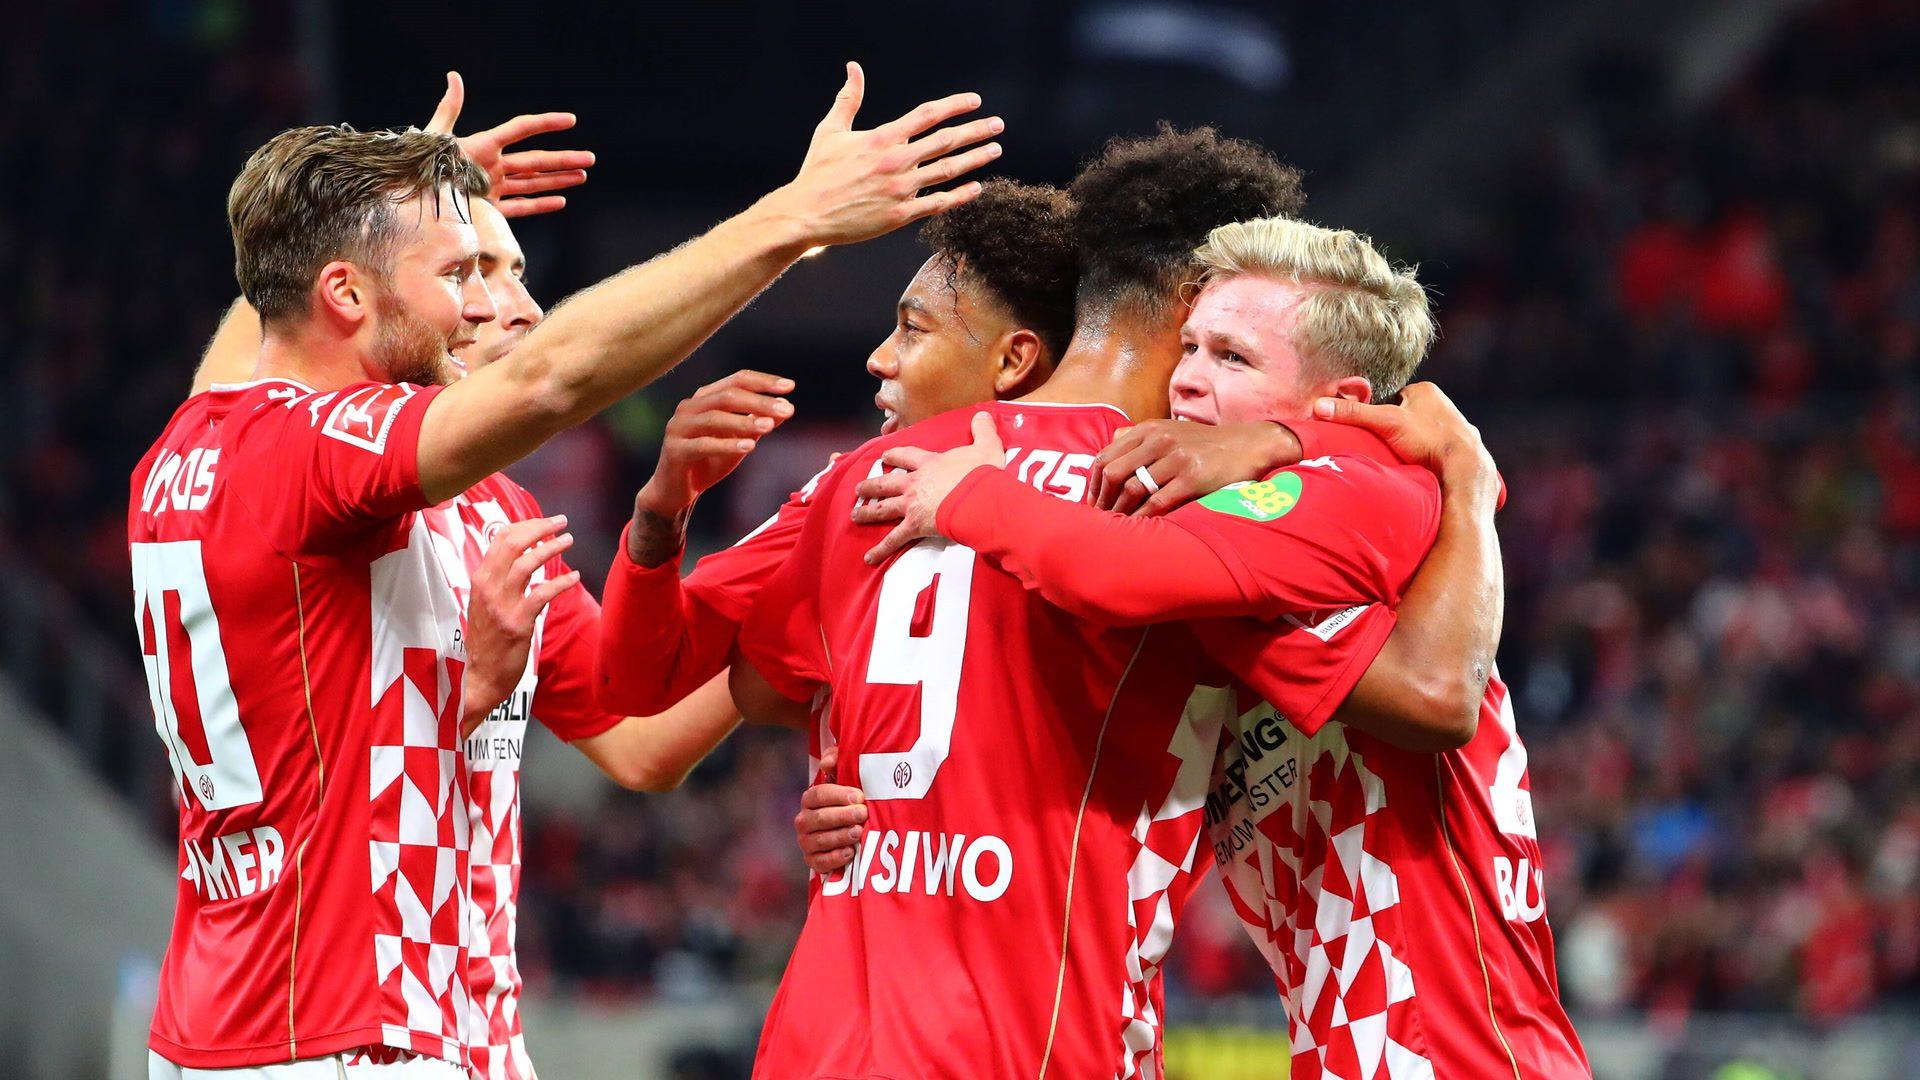 Burkardt stars as Mainz down Augsburg